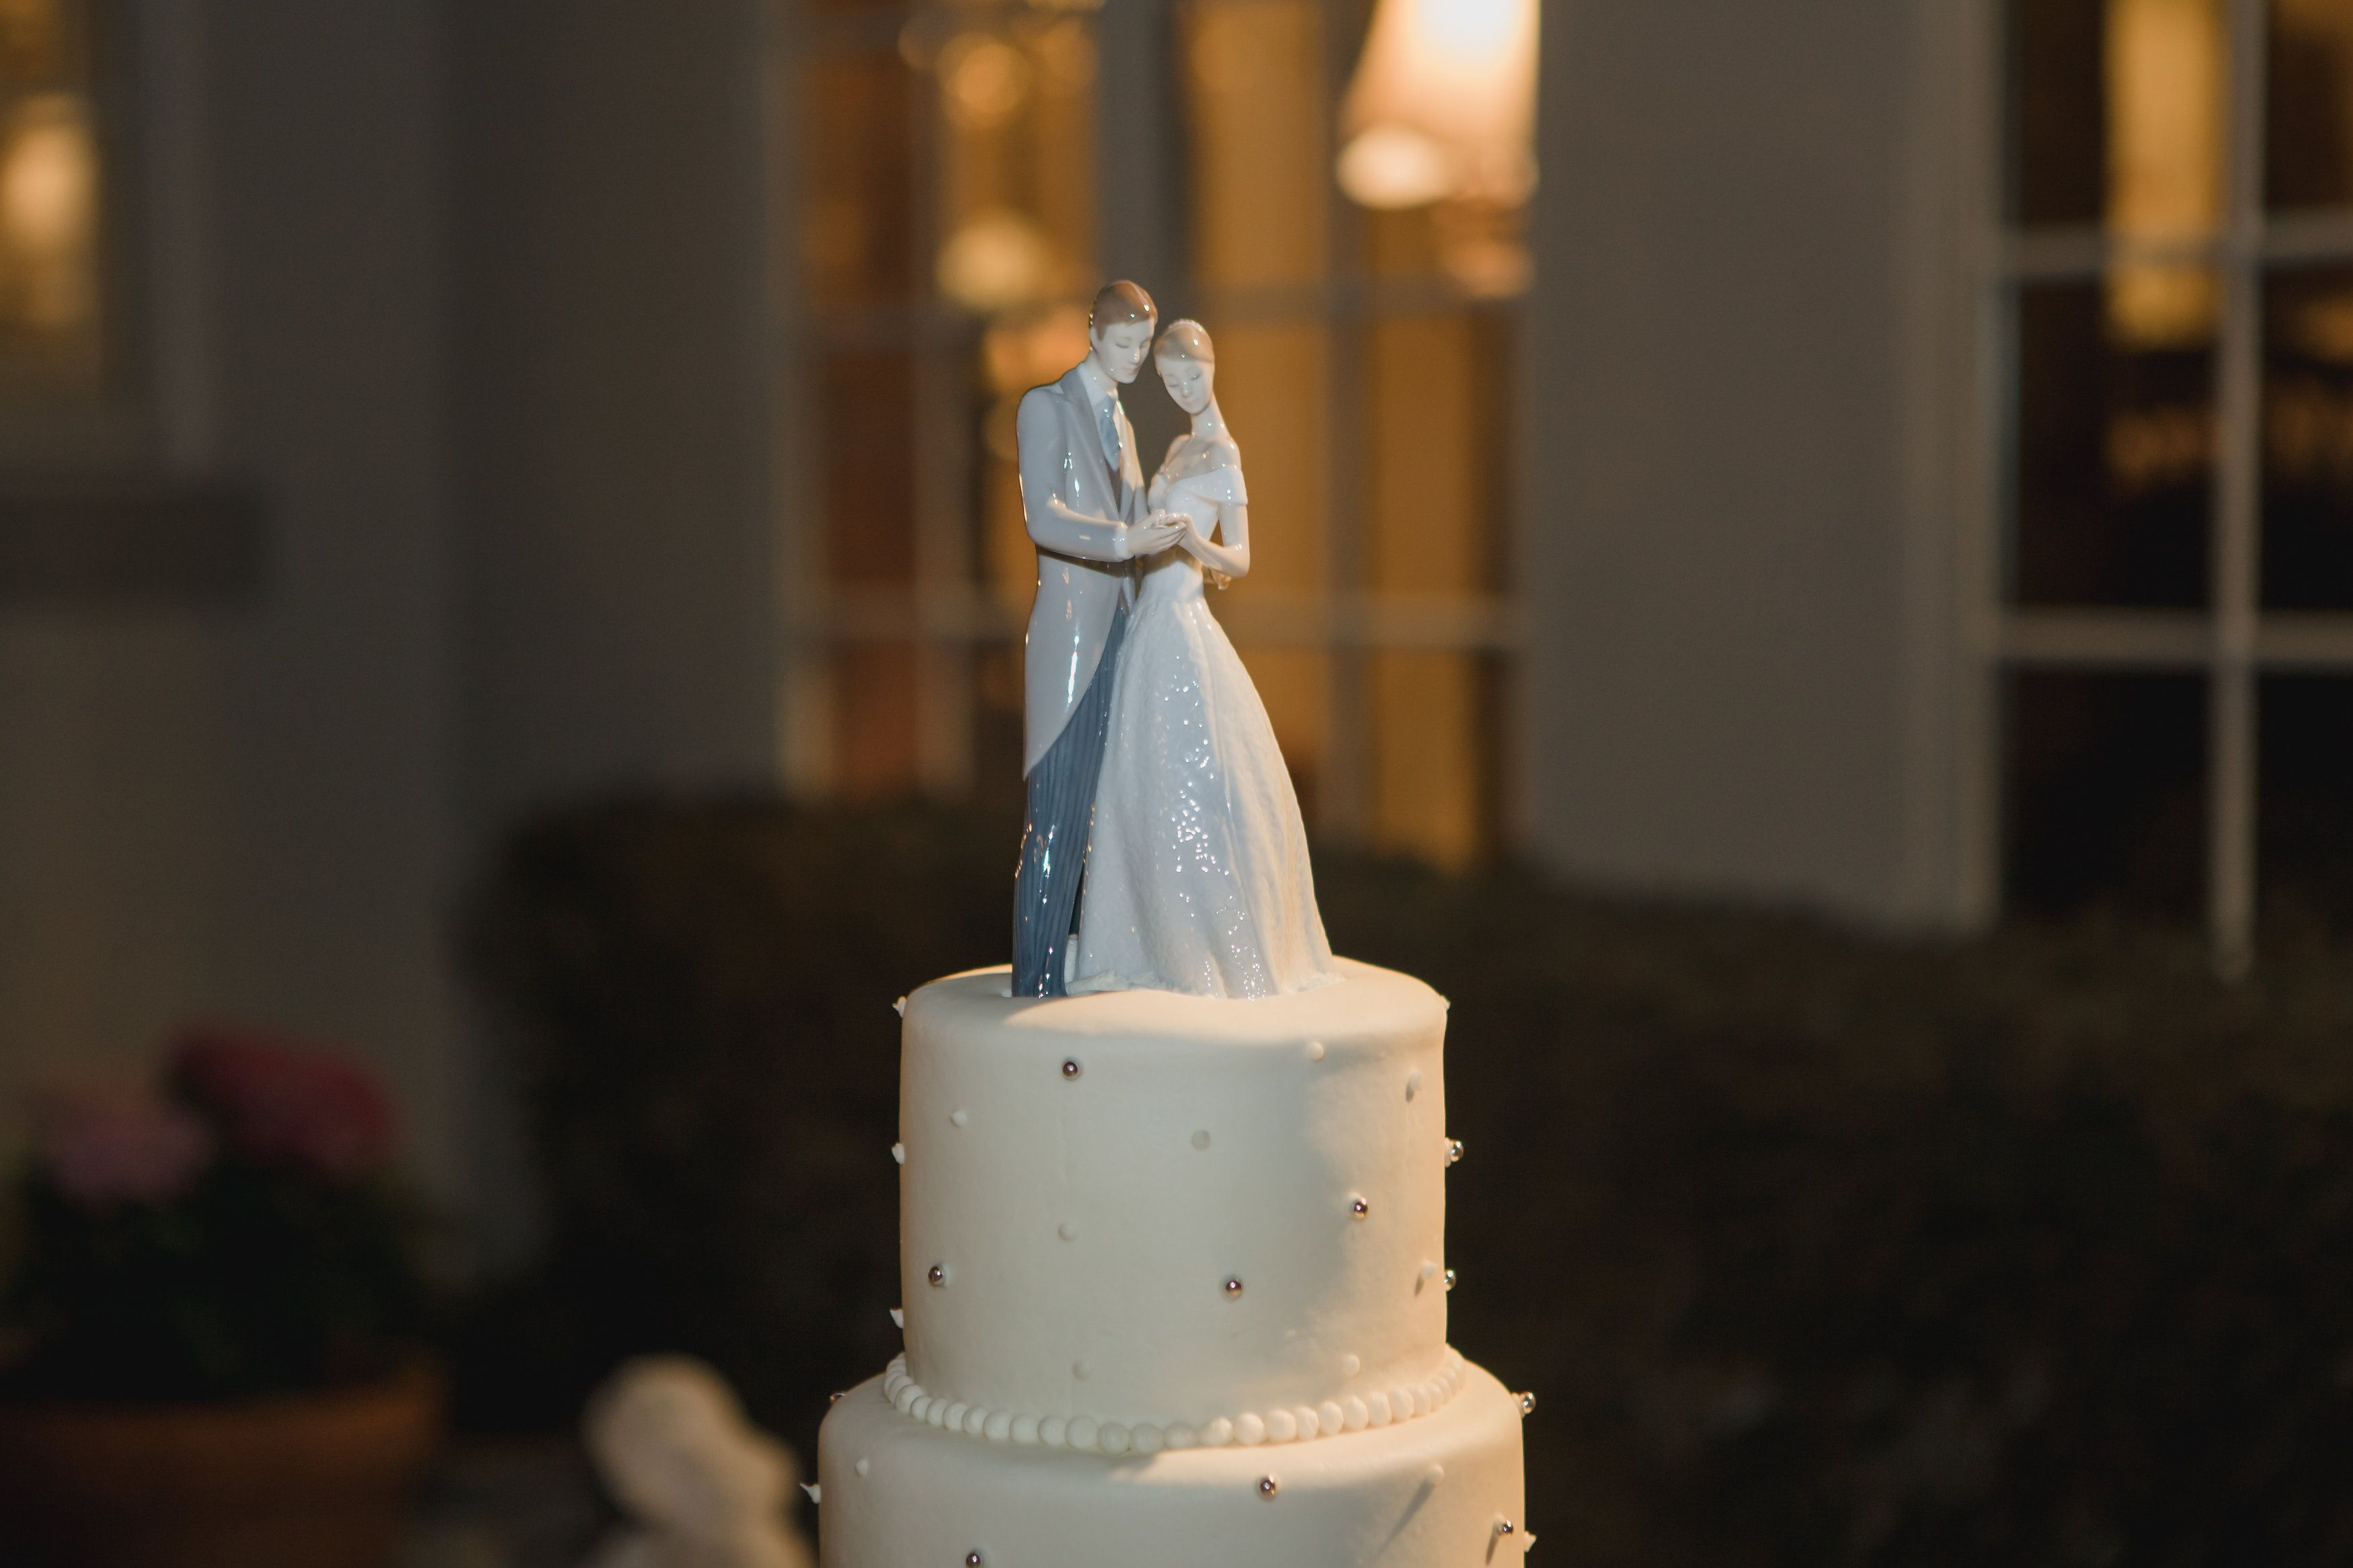 Lladro cake topper